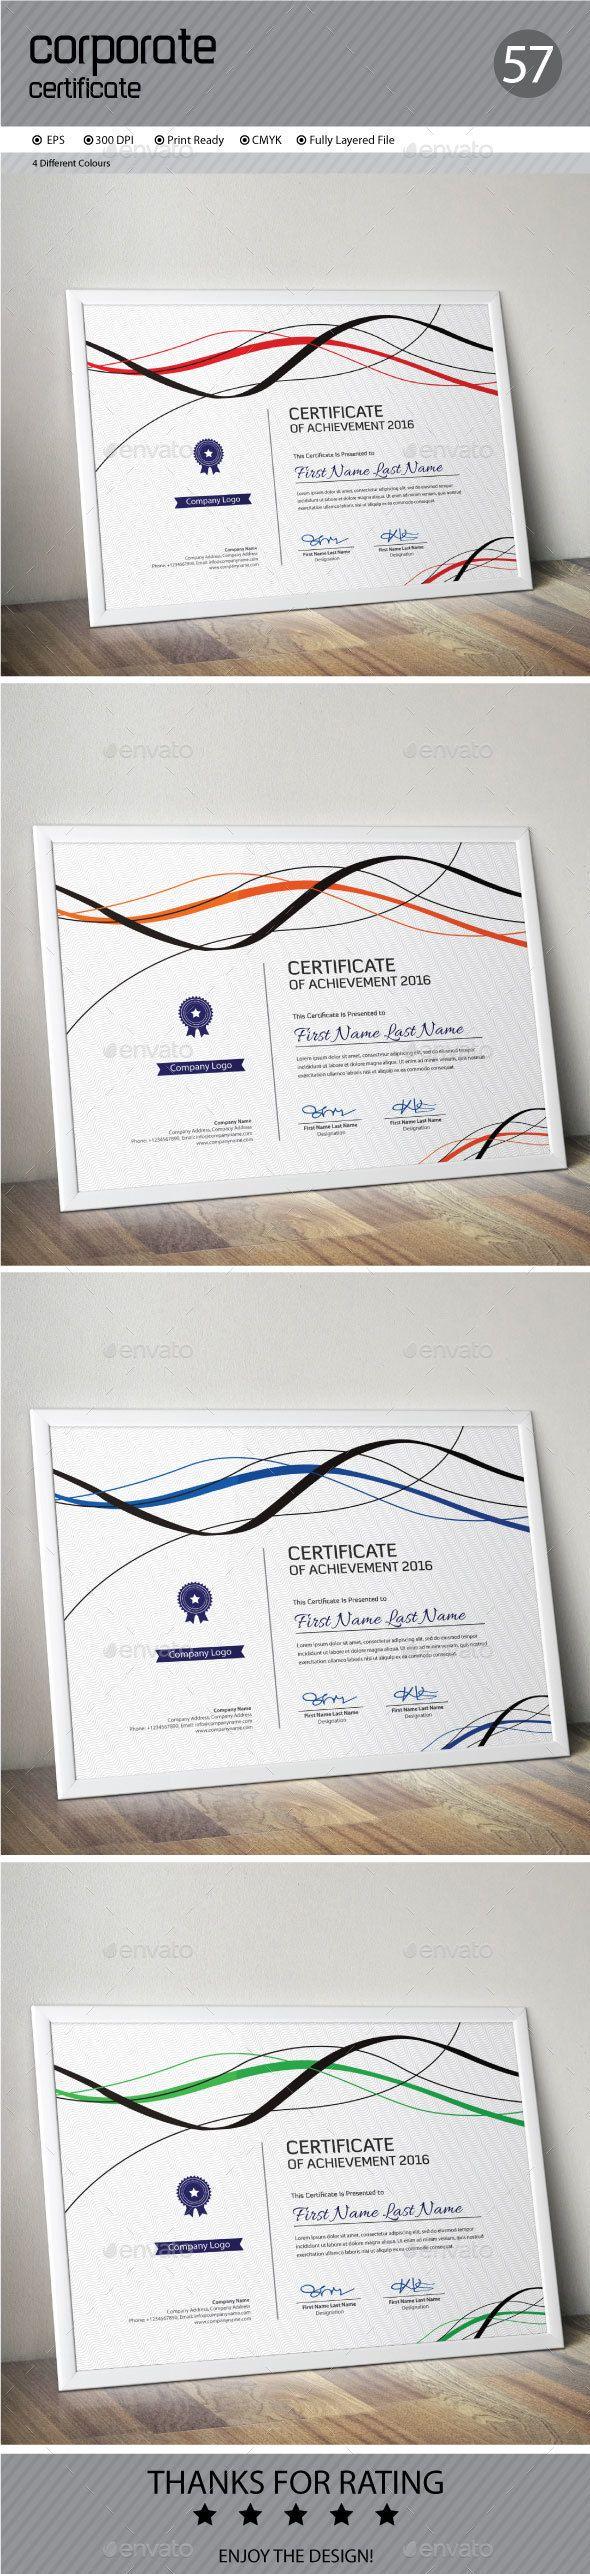 Certificate Template Vector EPS. Download here: http://graphicriver.net/item/certificate/14730462?ref=ksioks